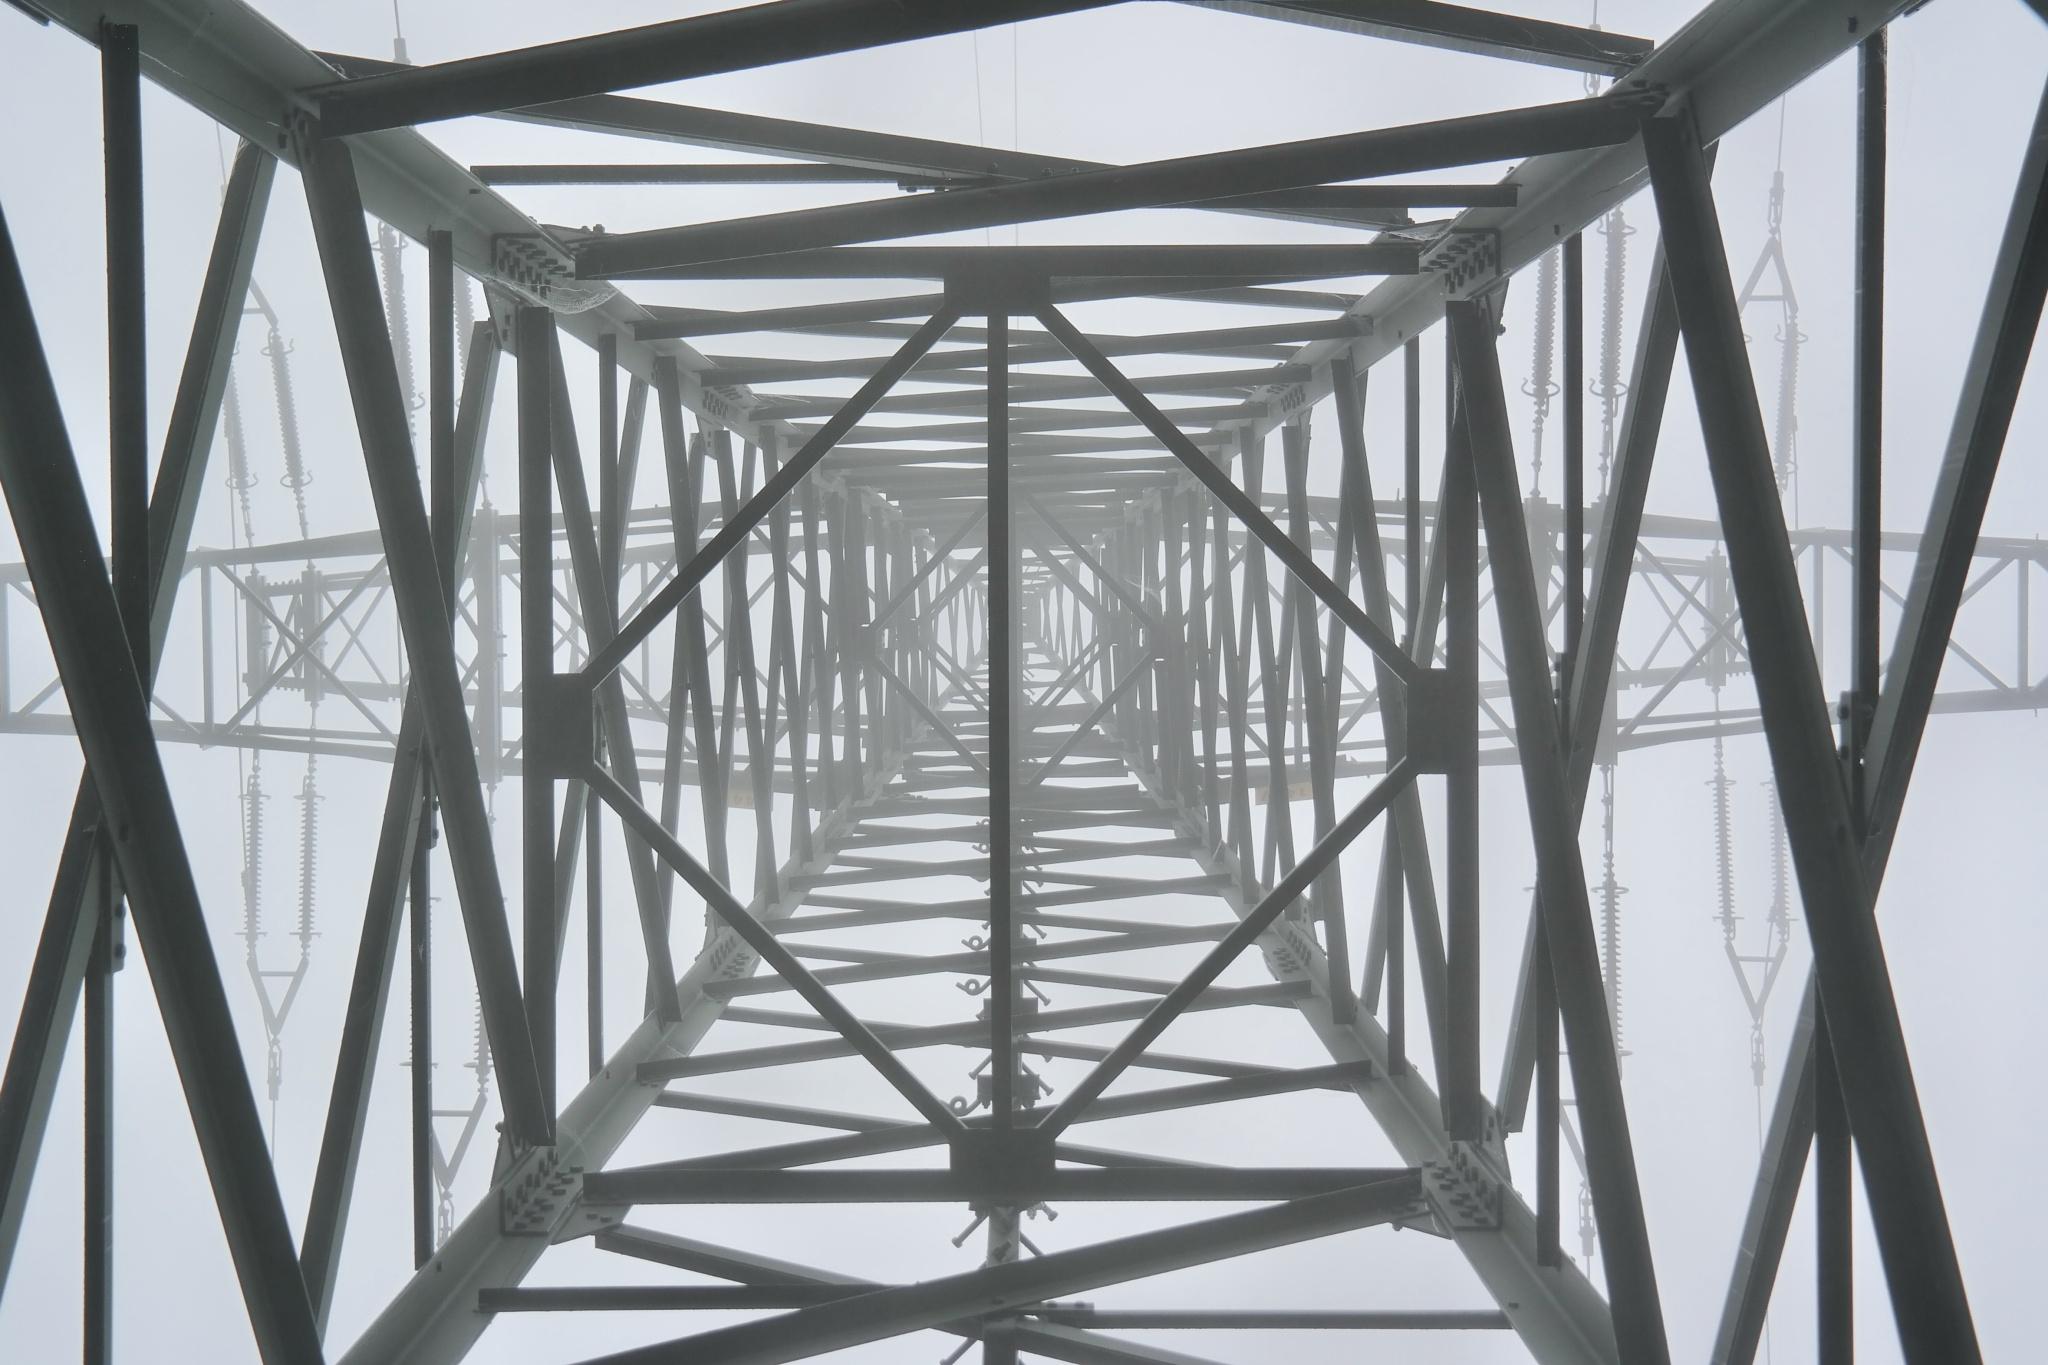 Turm im Nebel by Hotel Buchenhain Photography